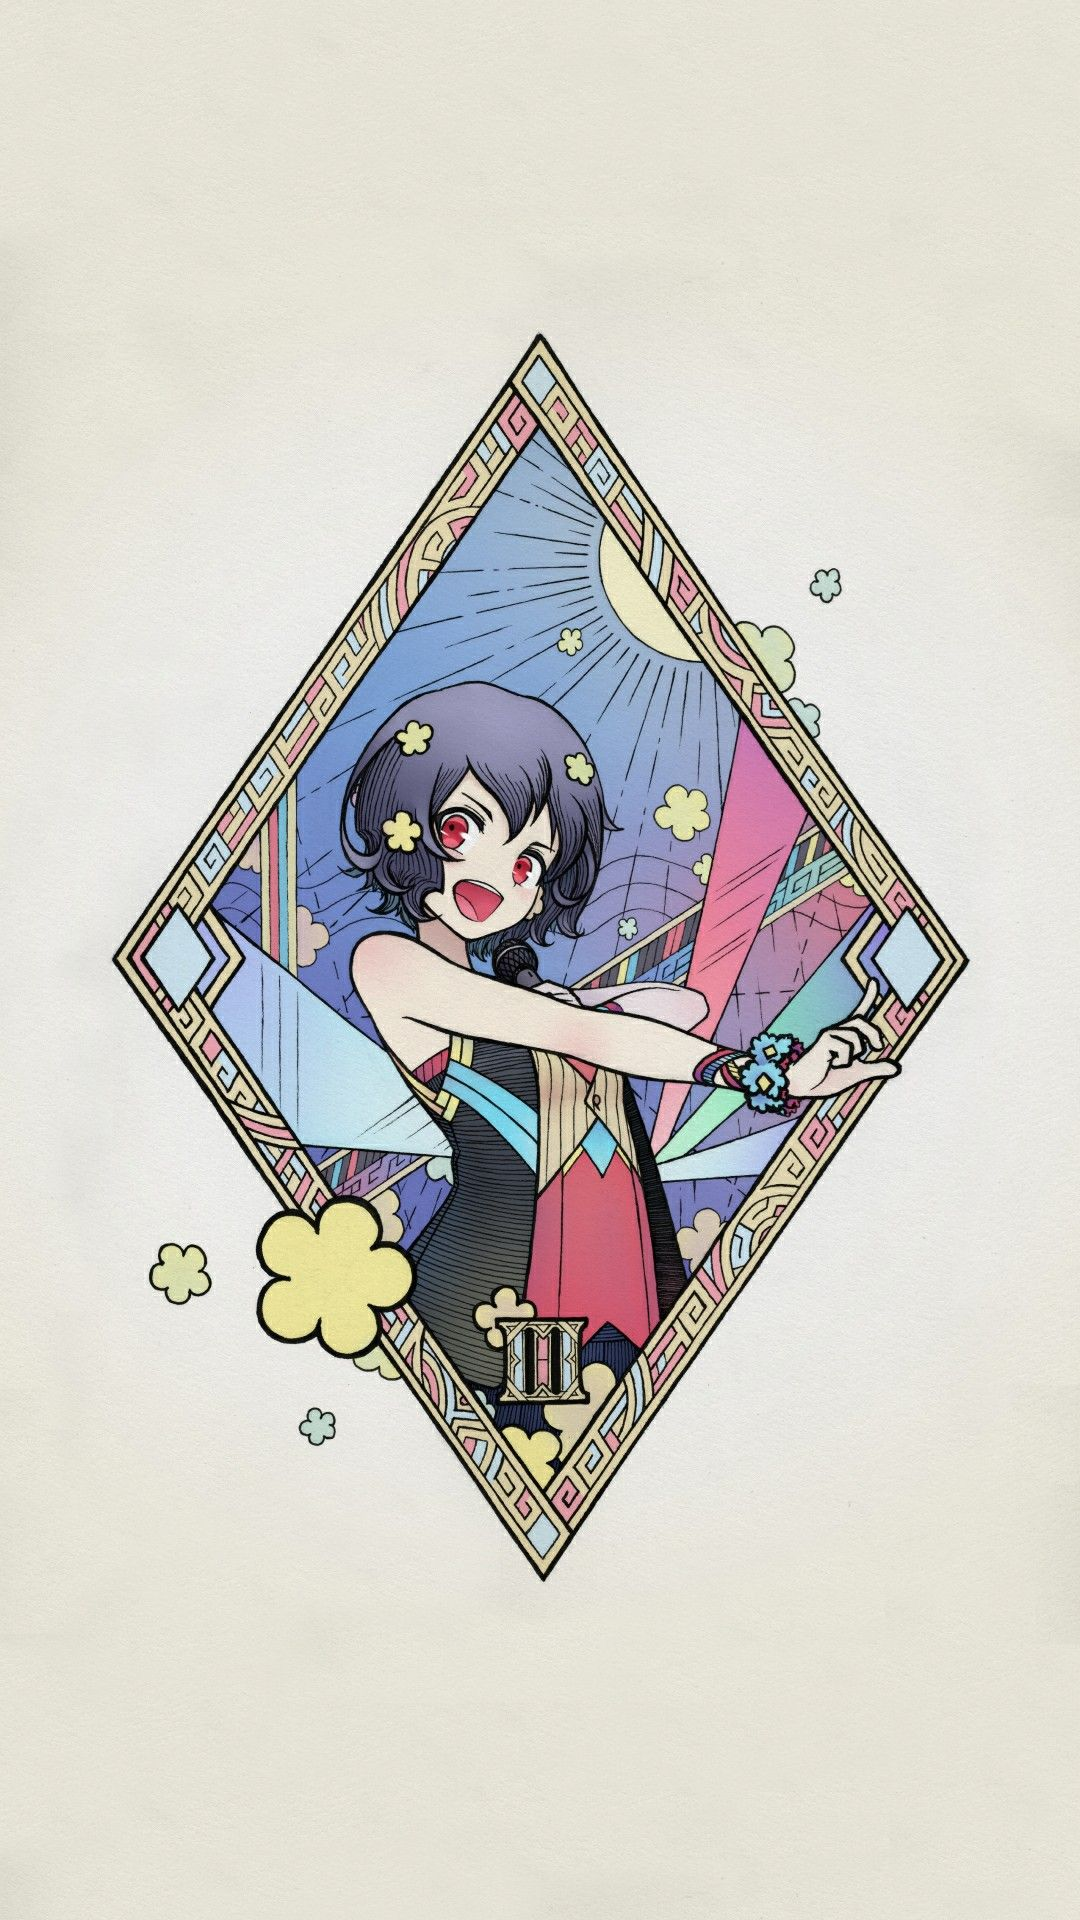 Pin By Akari Darling On Zombieland No Zombie No Saga Zombie Land Saga Zombieland Anime Wallpaper